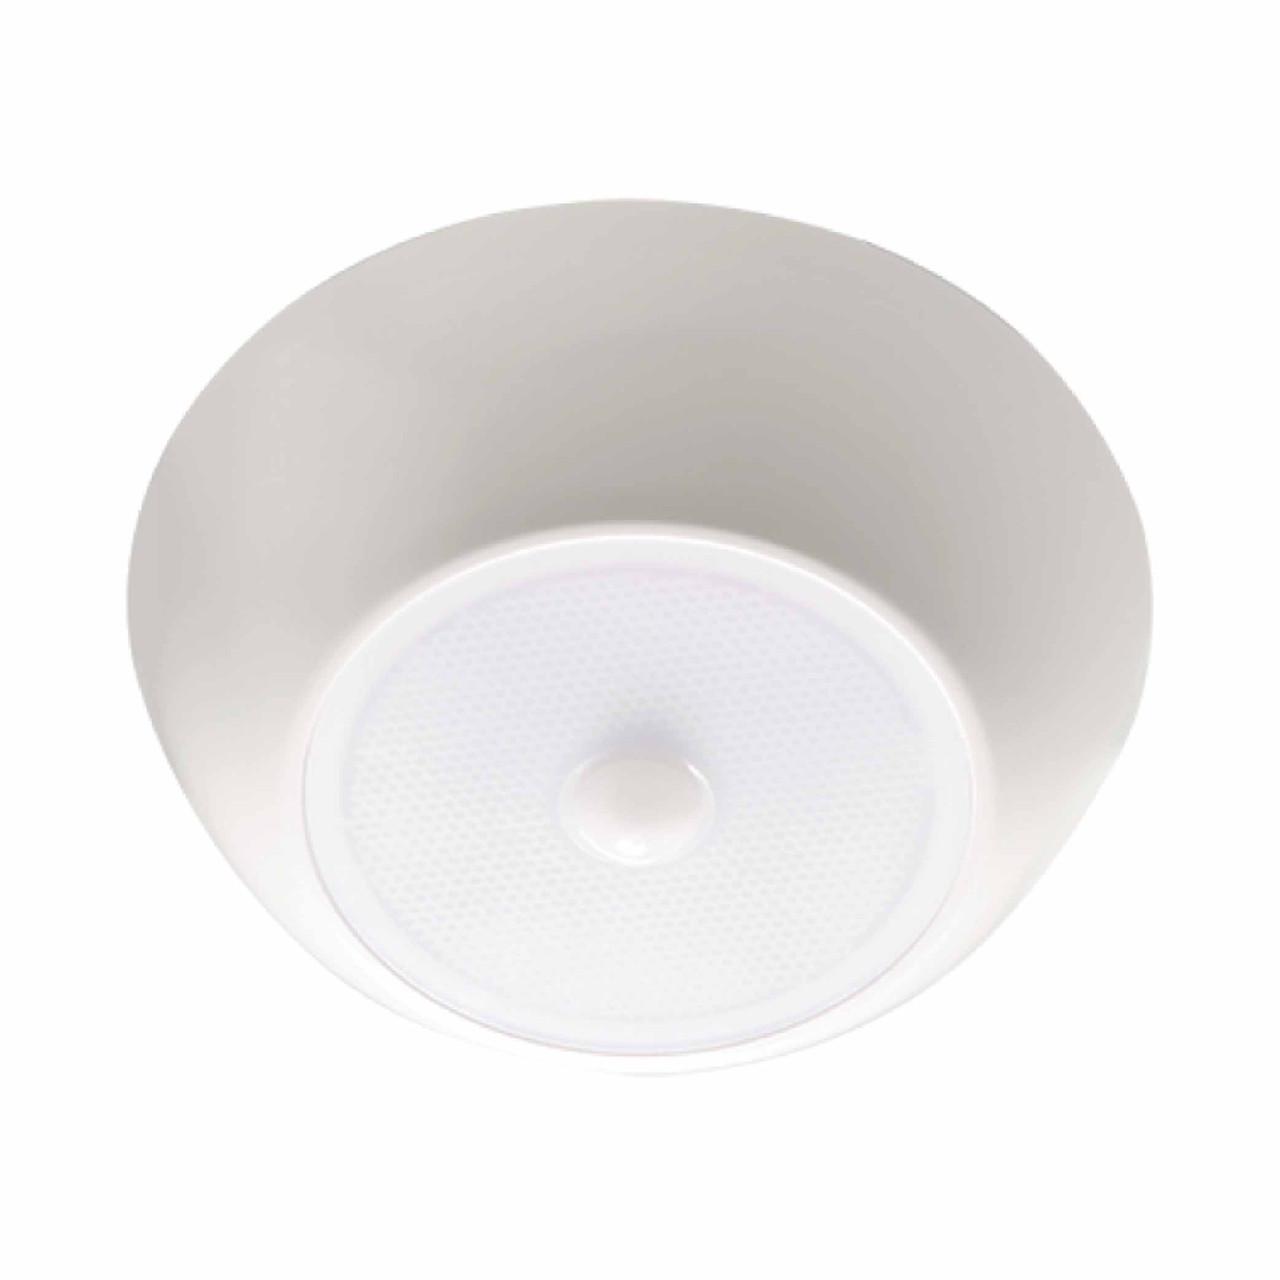 Motion Sensor Ceiling Light 300 Lumens Mr Beams